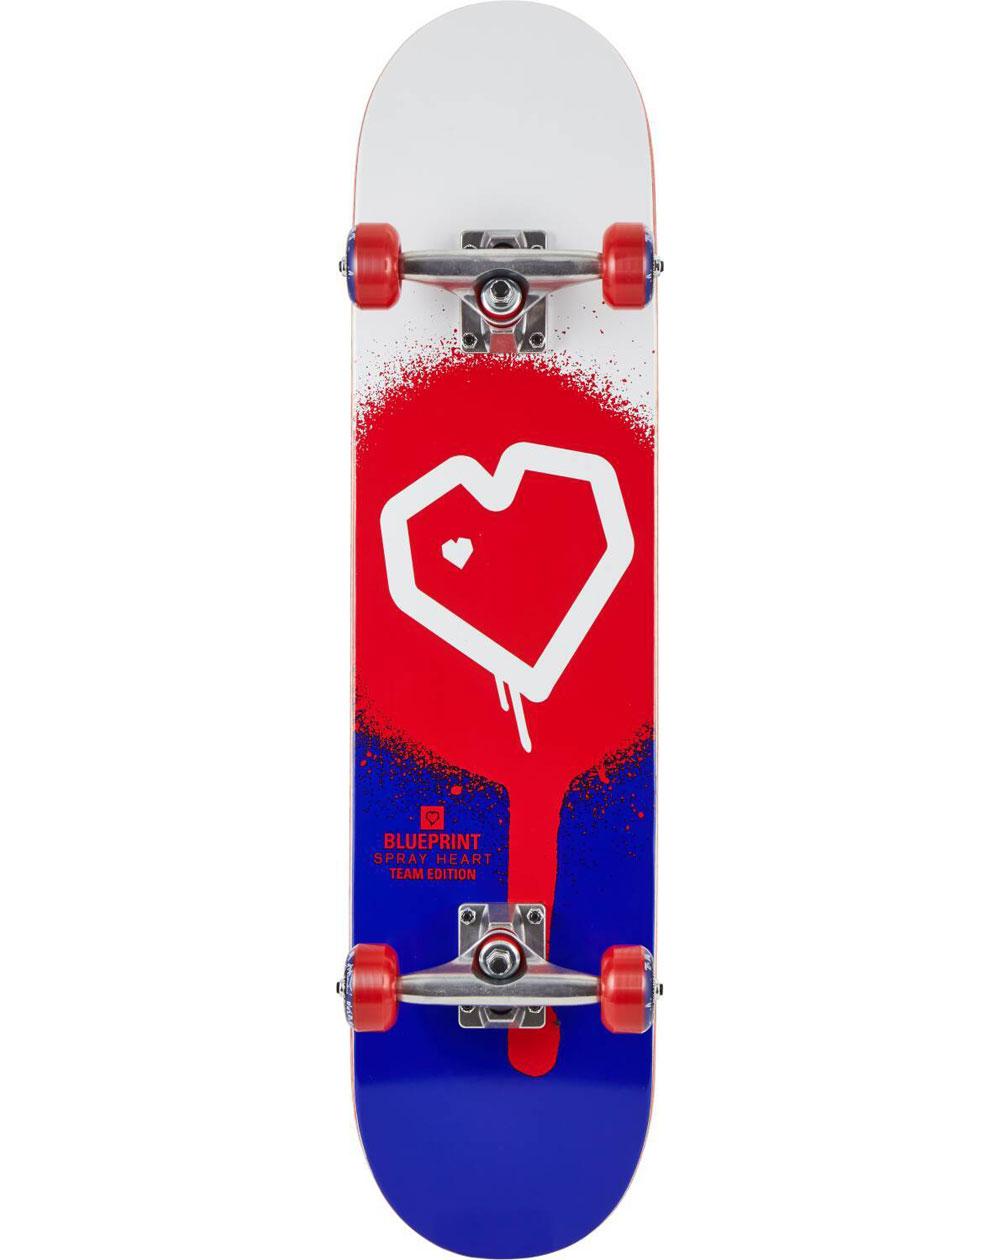 "Blueprint Skateboard Complète Spray Heart V2 8.00"" Red/Blue"